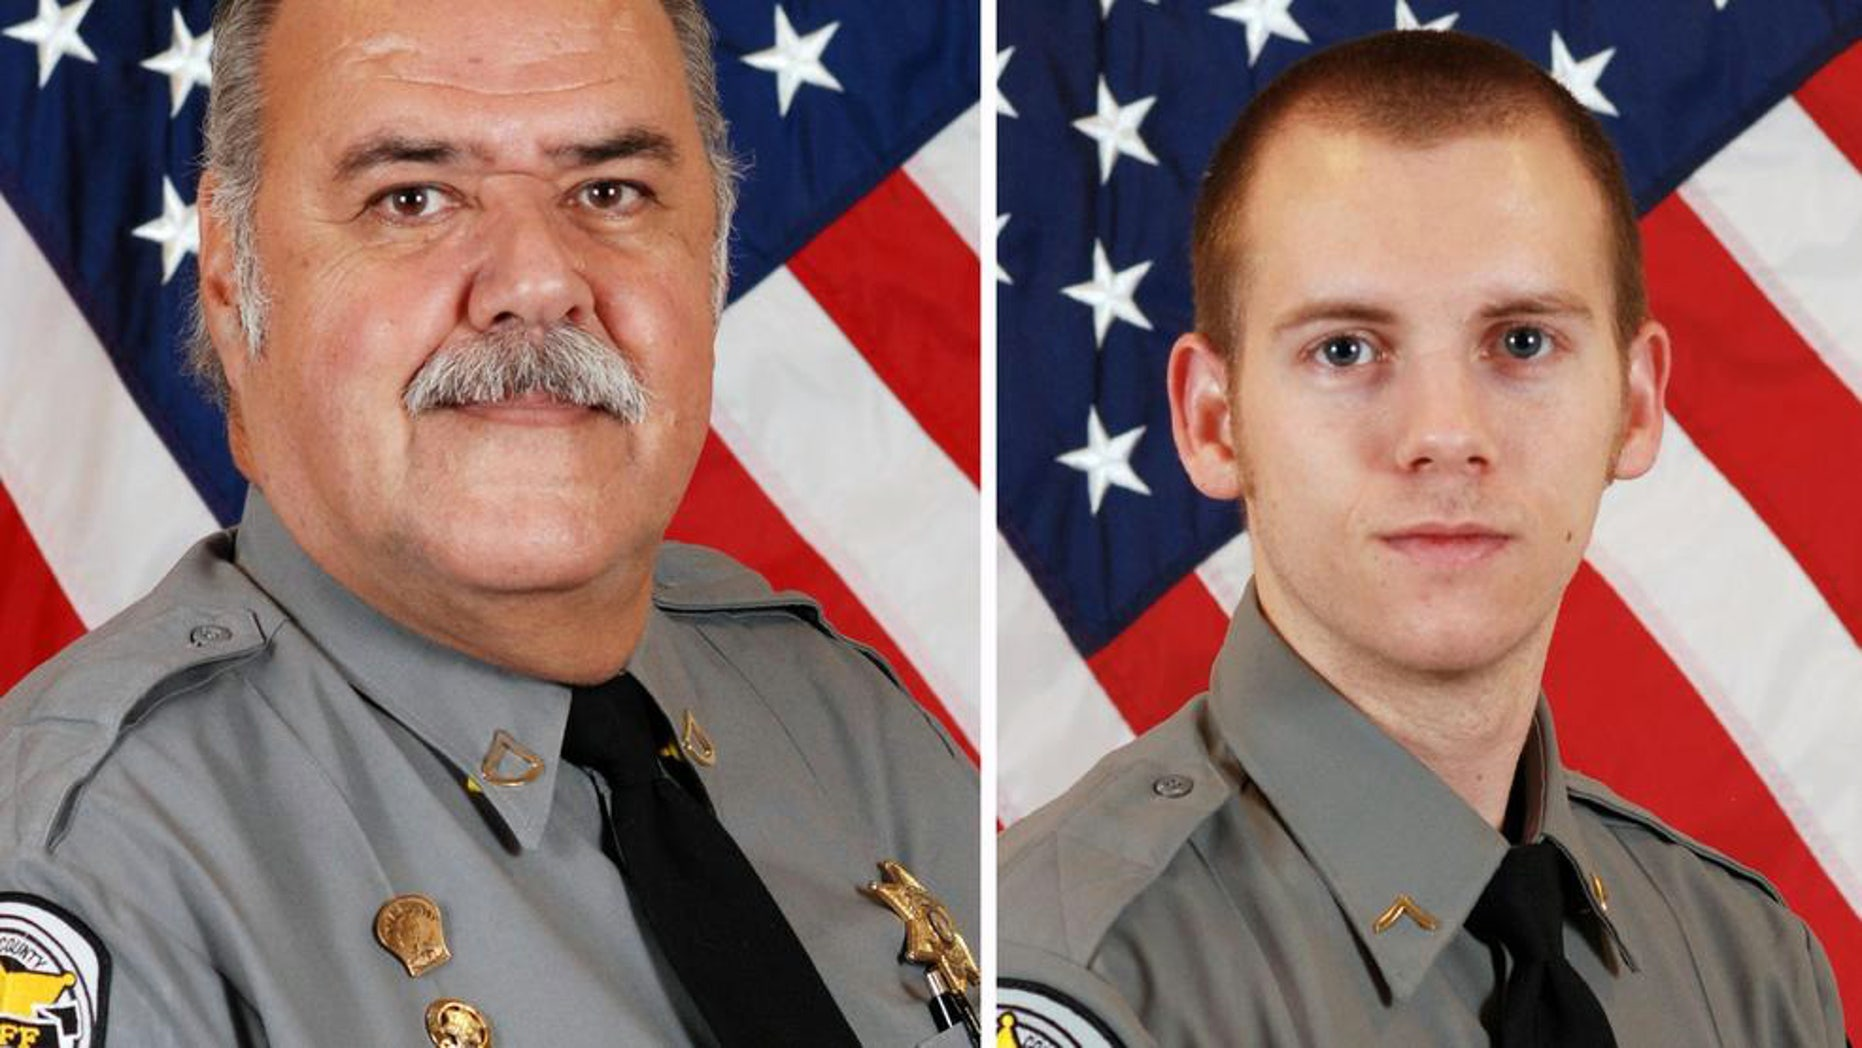 Former Horry County Sheriff's Deputies Stephen Flood and Joshua Bishop